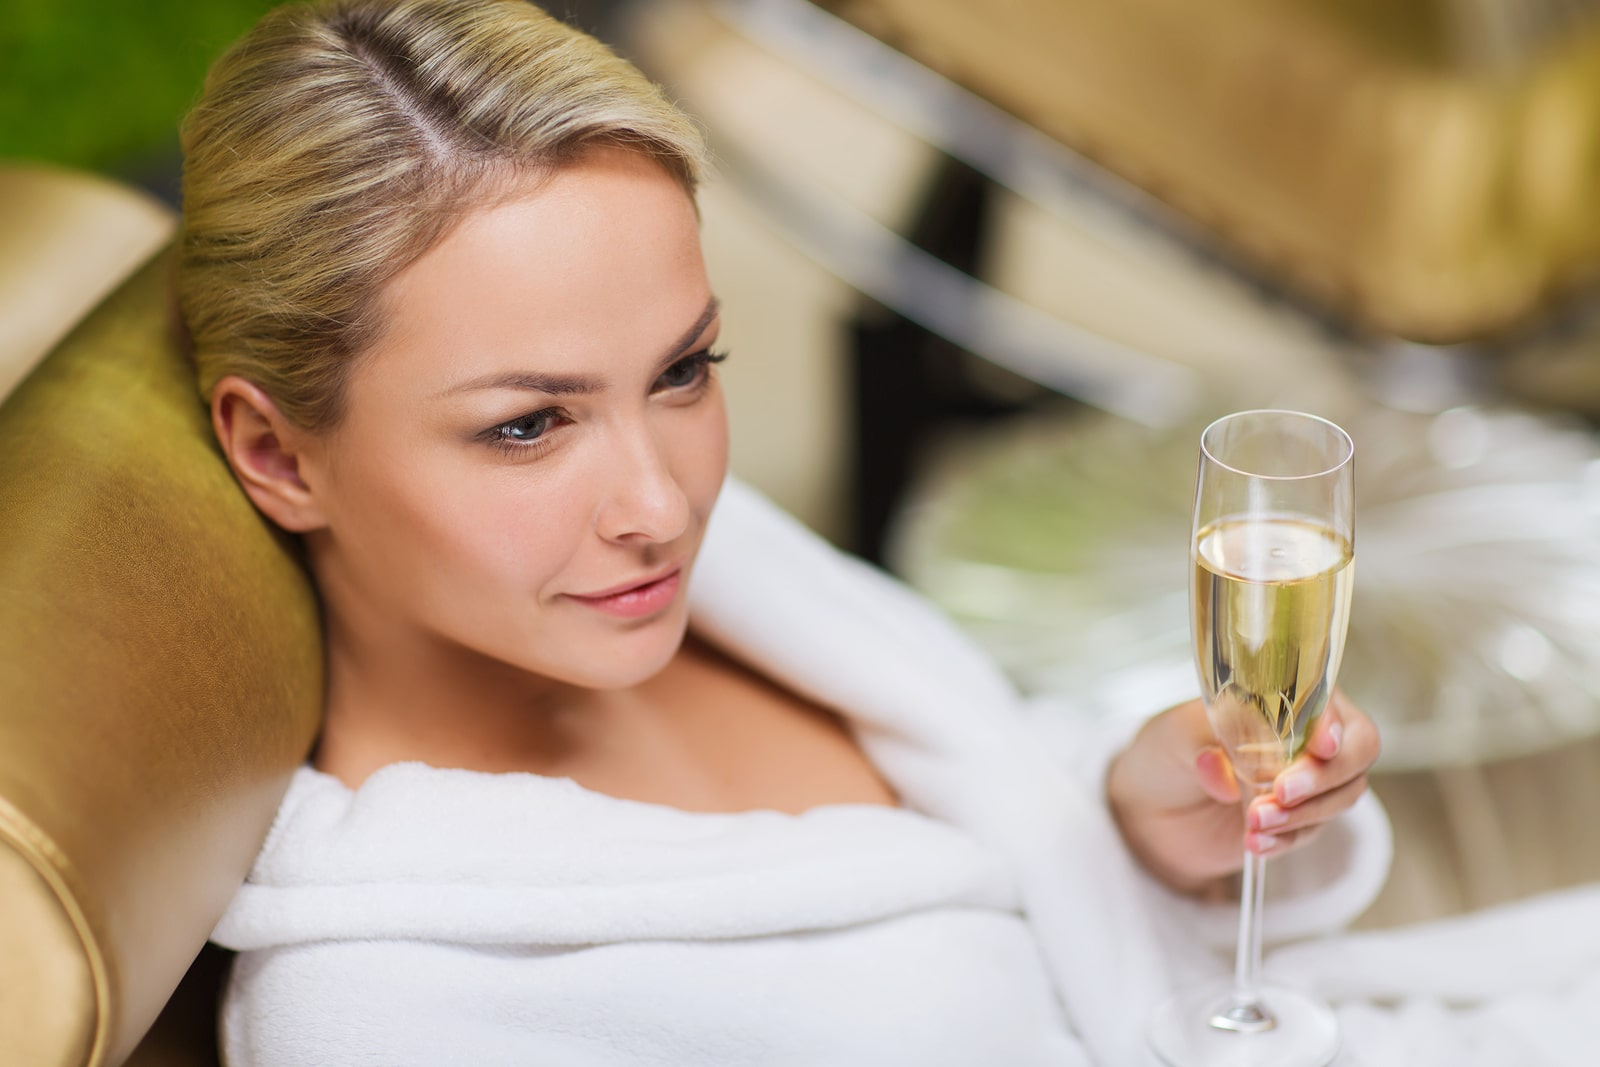 Conoce este beneficio de tomar champagne